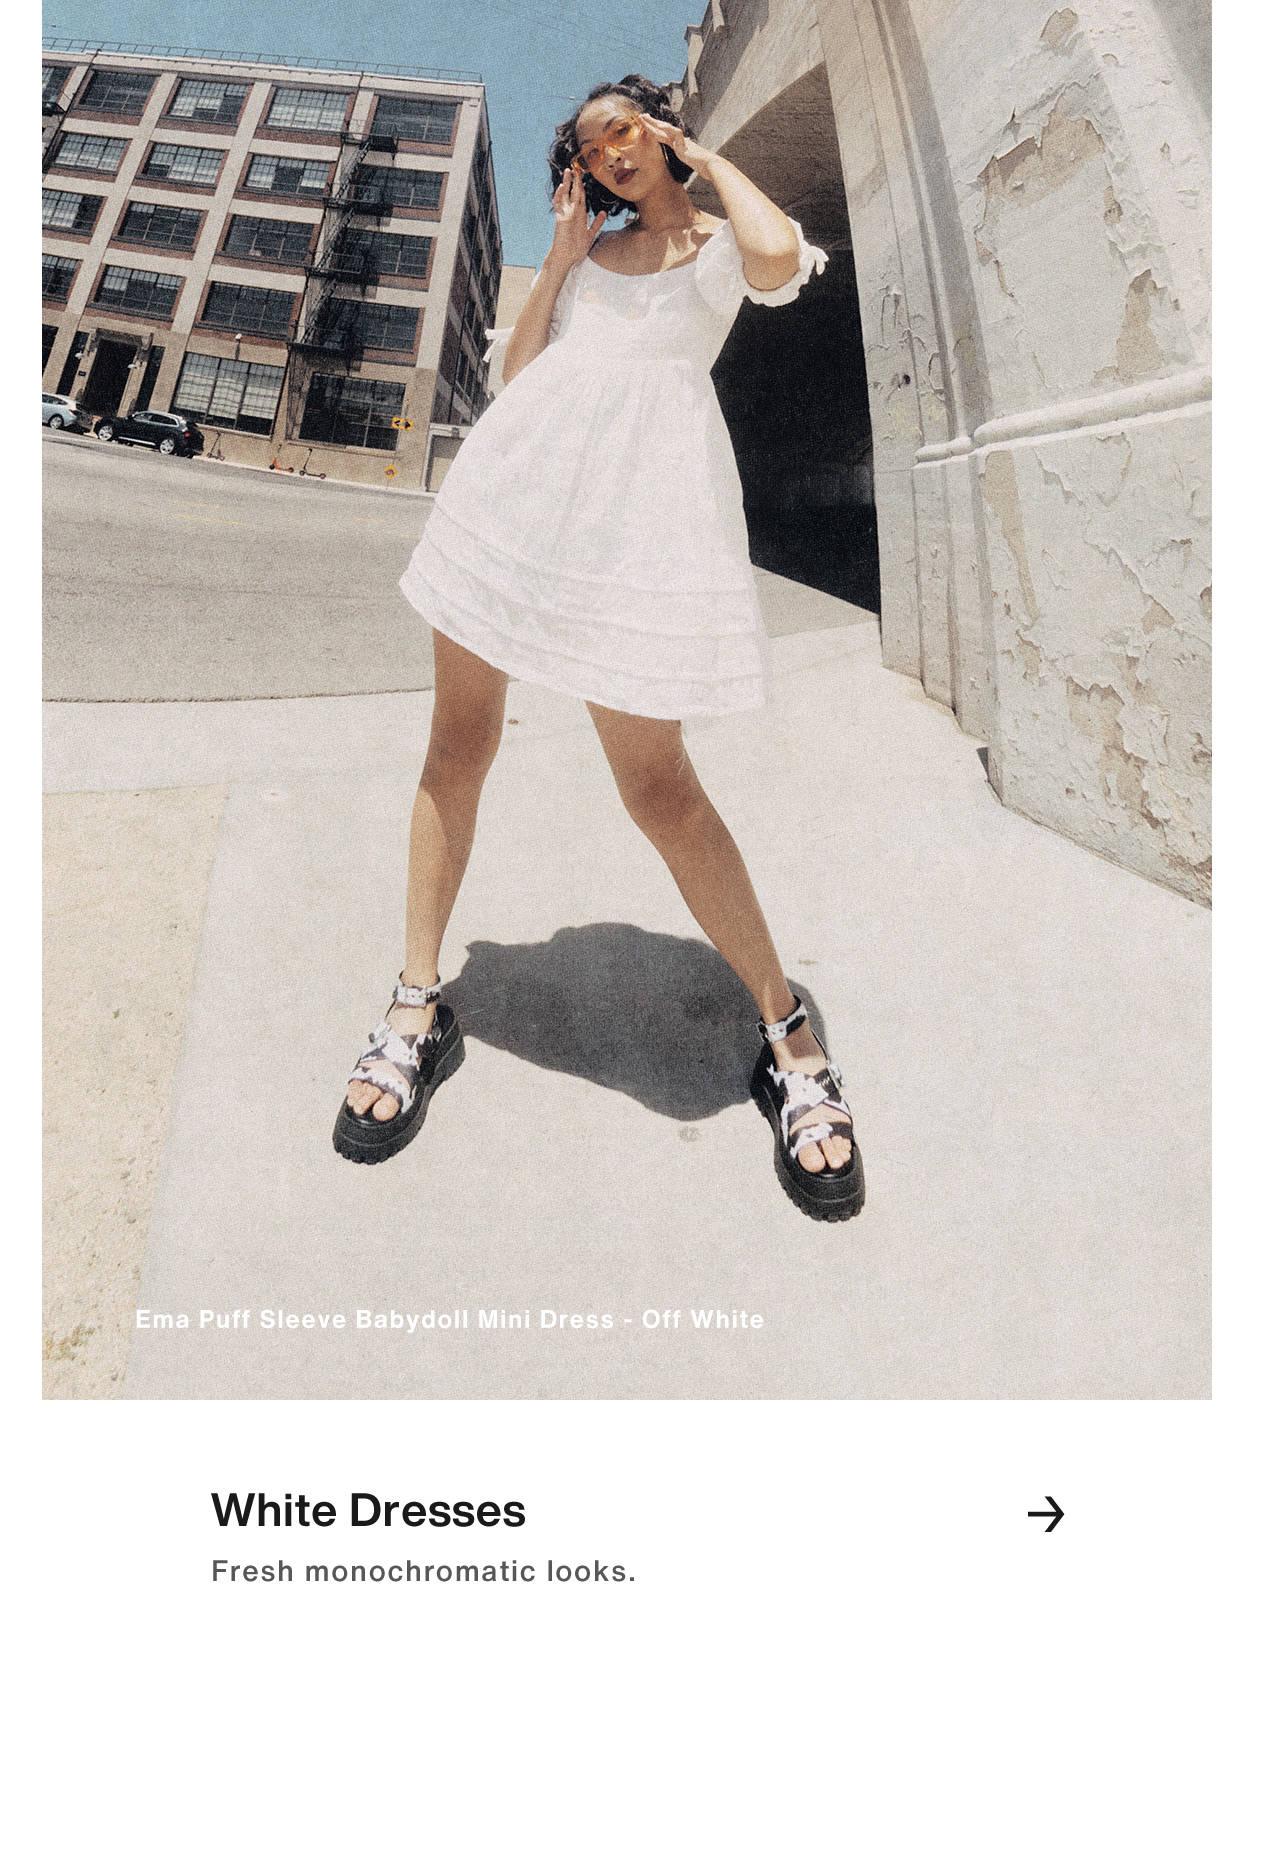 White Dresses - Effortless Style.